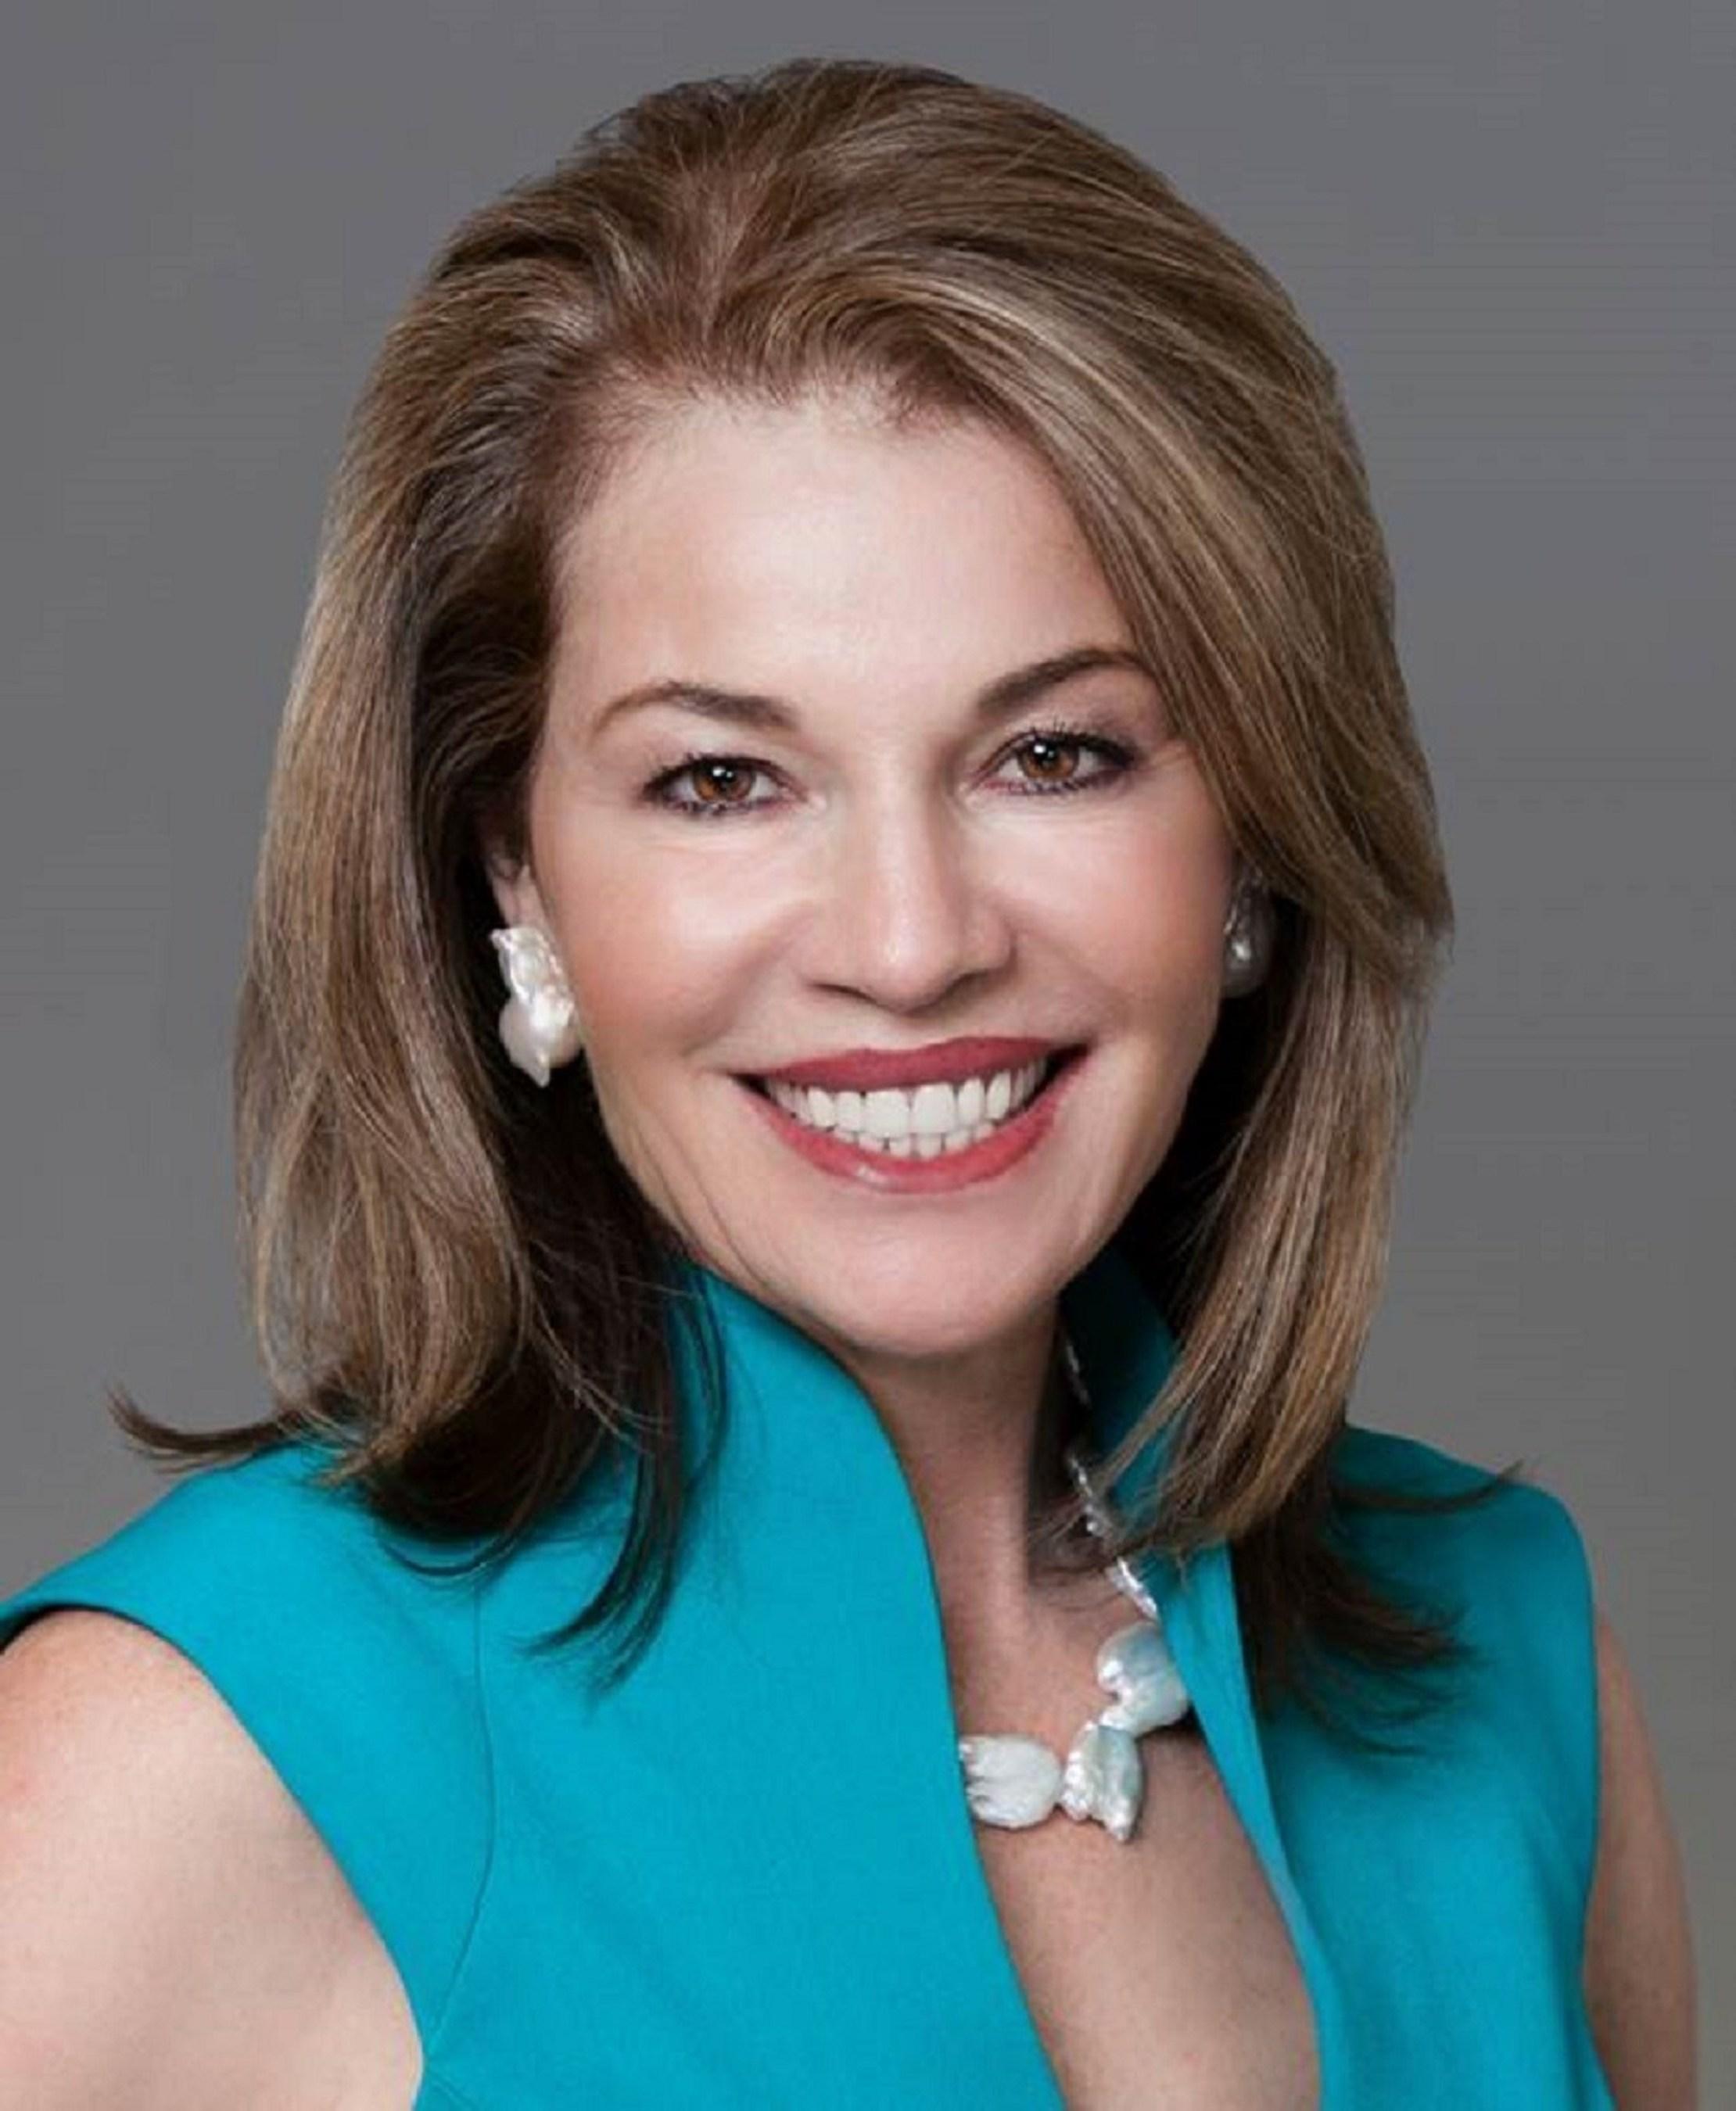 Teresa Carlson, Vice President Worldwide Public Sector, AWS, Inc.